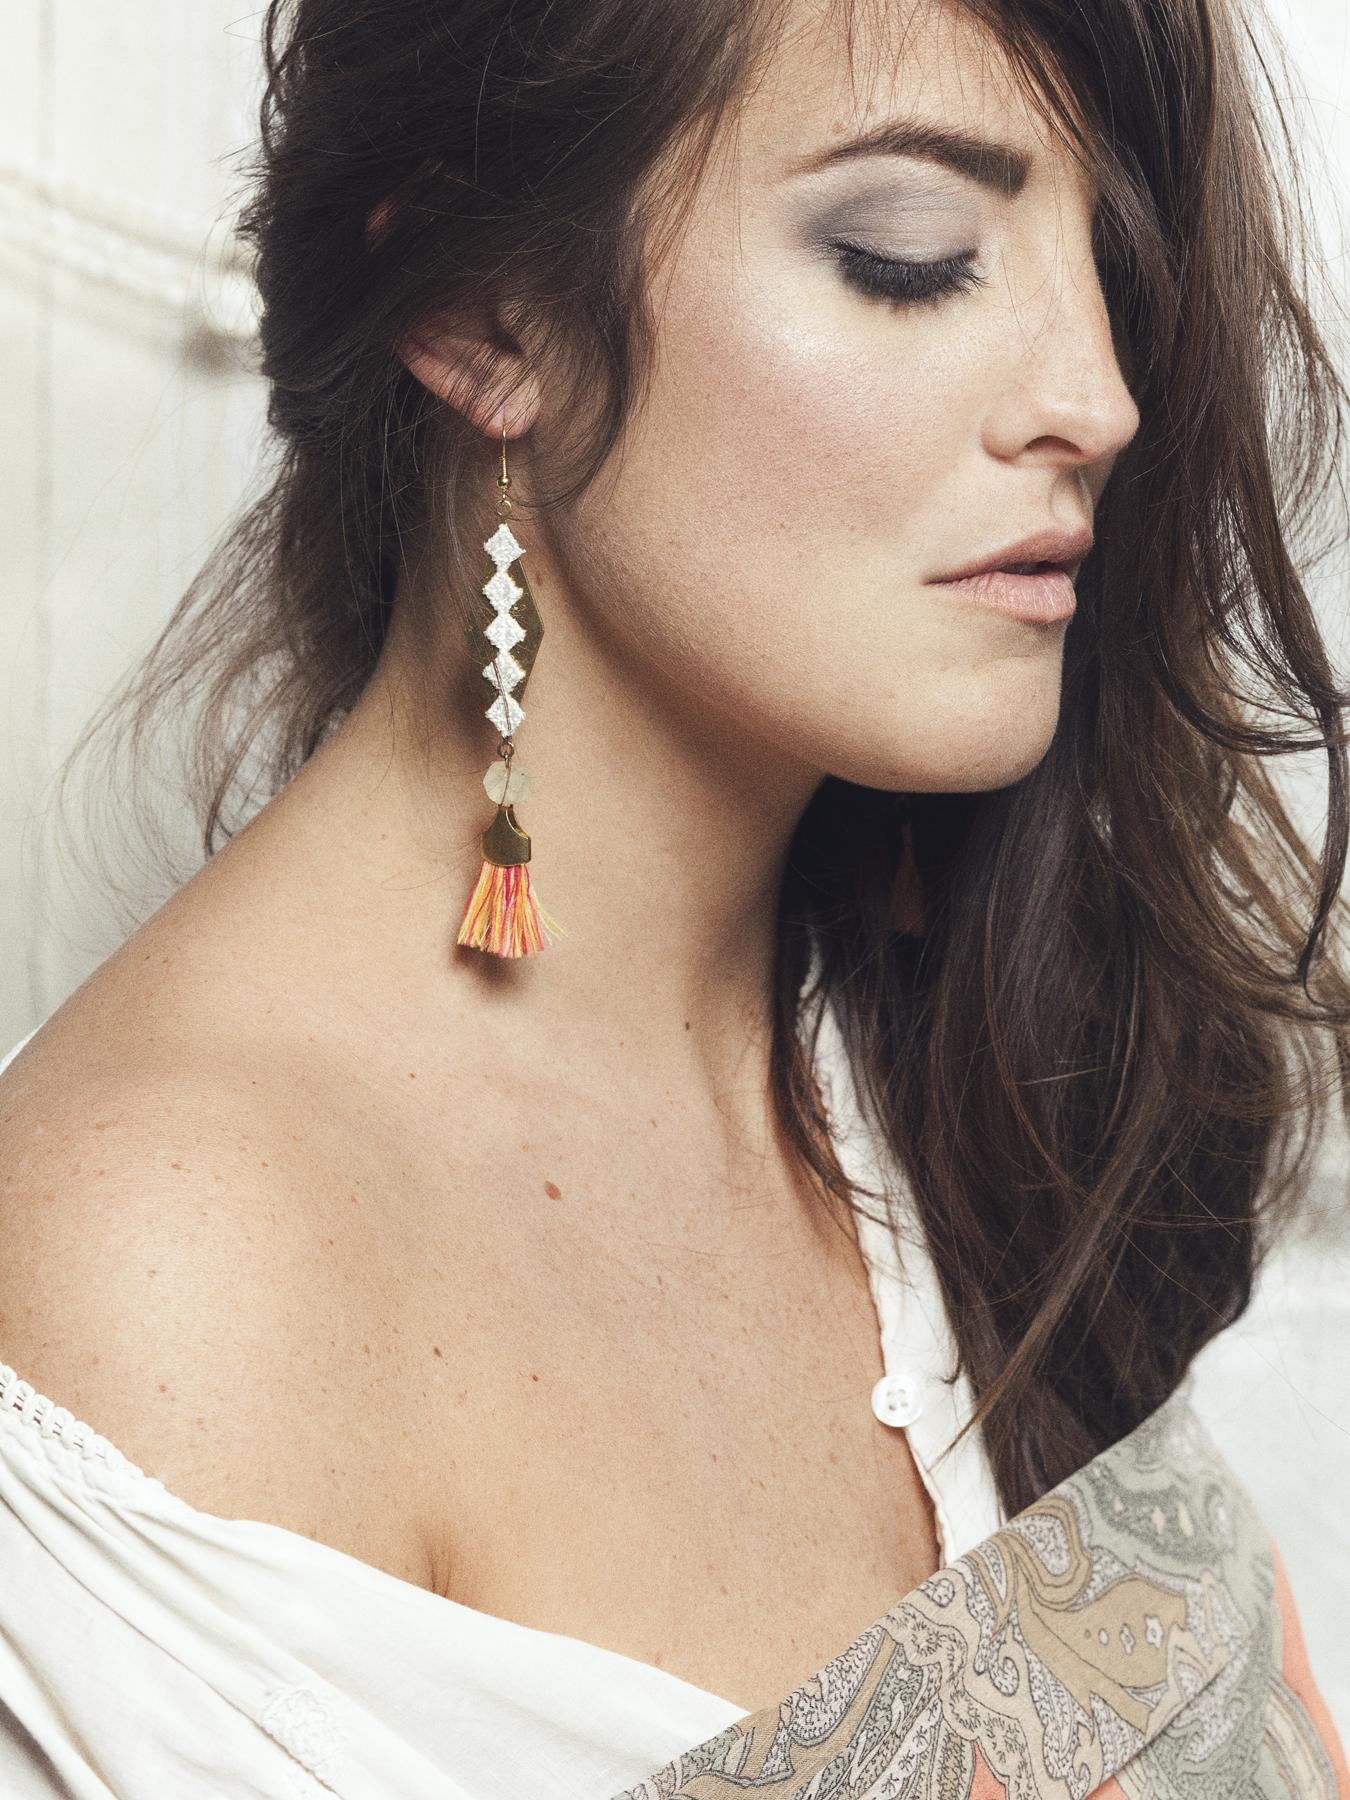 Cali earrings (details here)